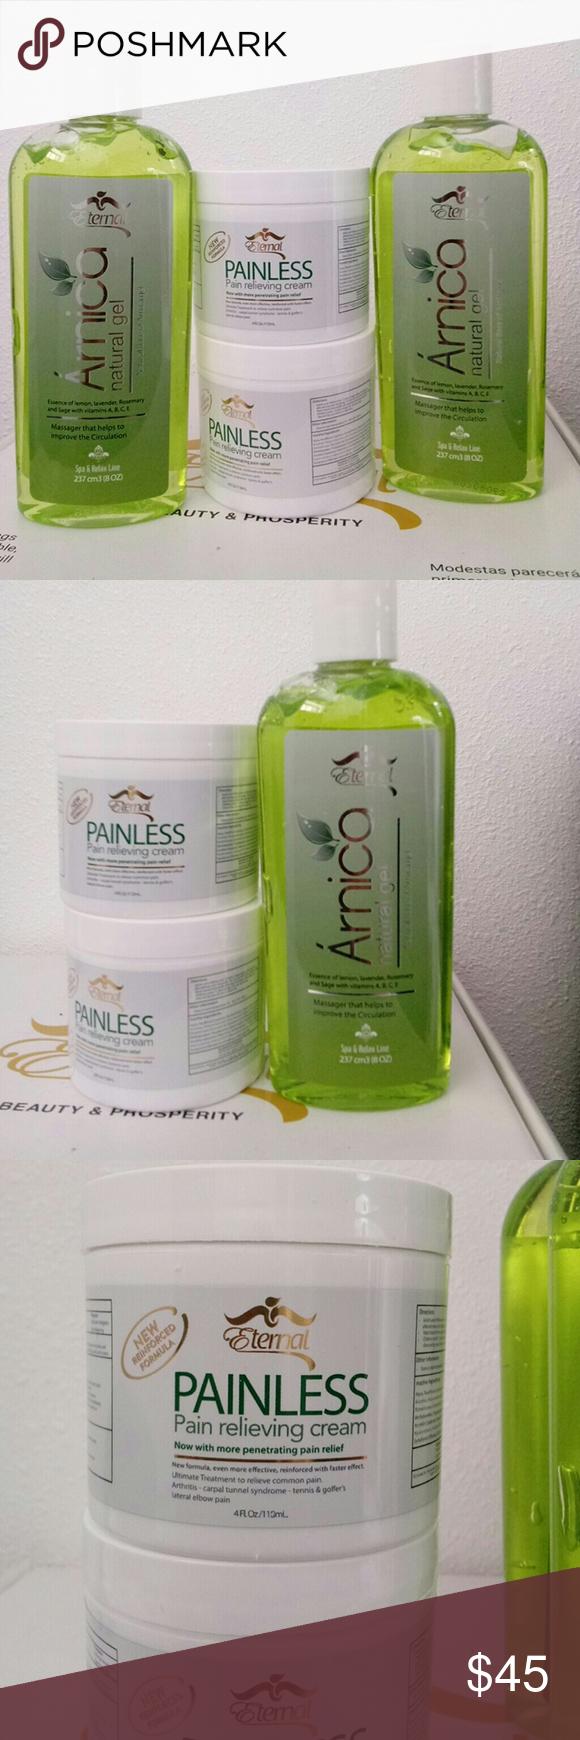 2 Arnica Natural Gel 2 Painless Cream Painless Gel Cream